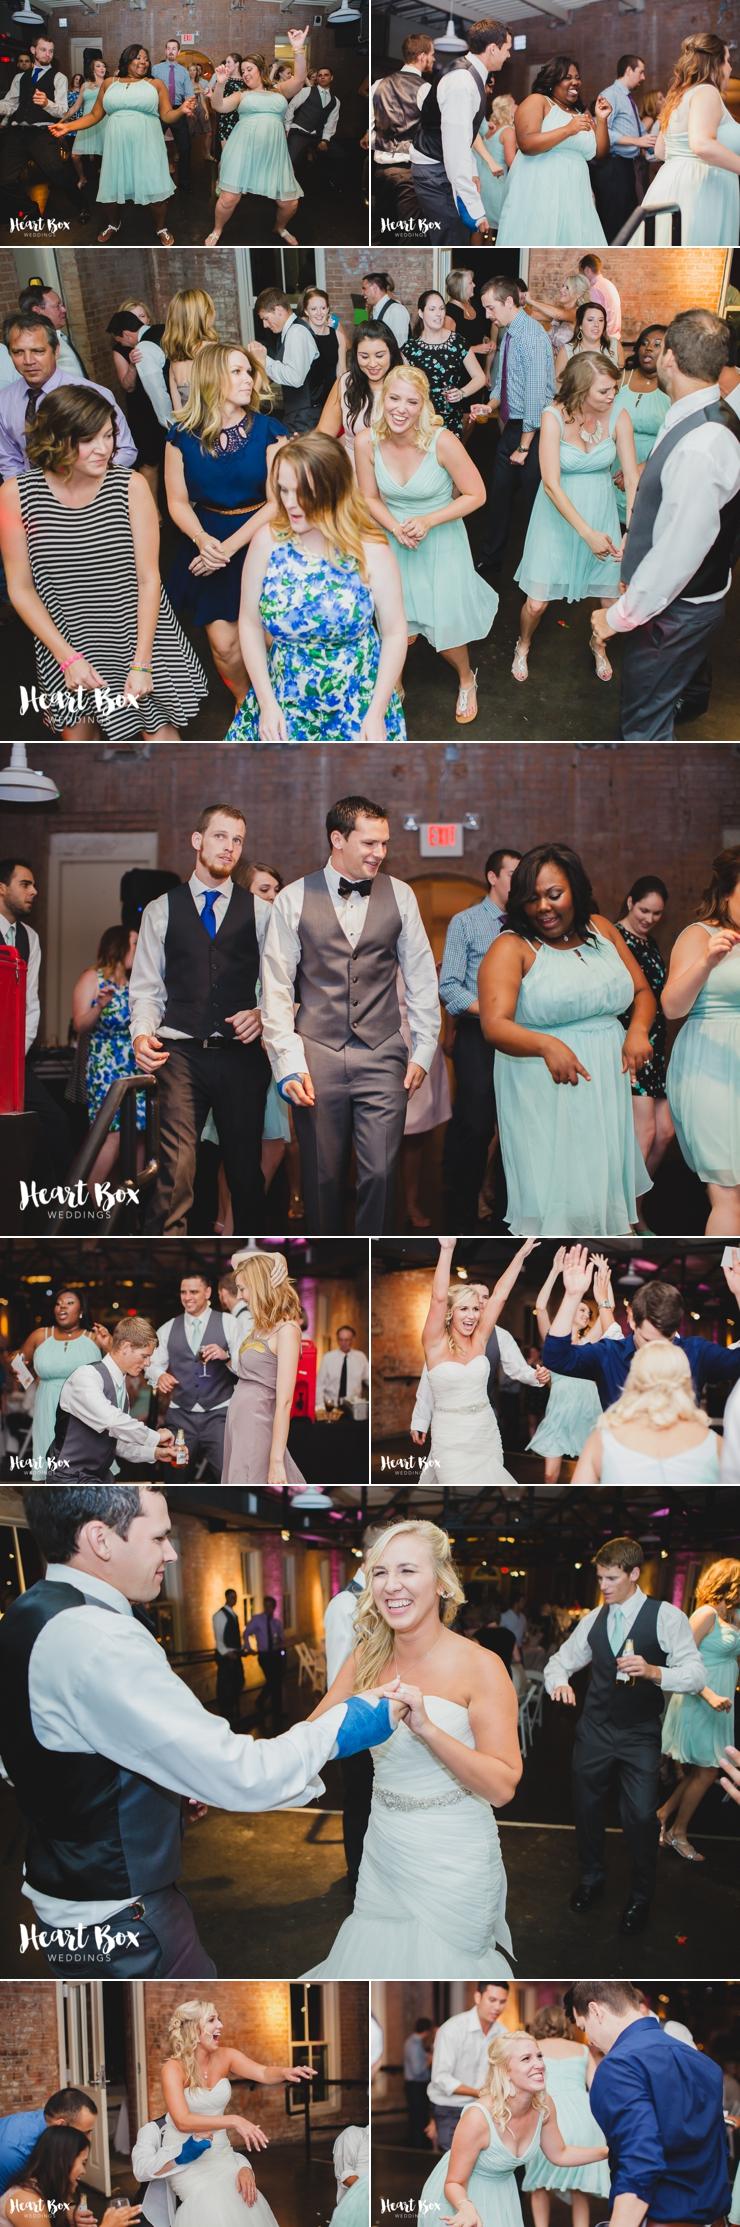 Gould Wedding Blog Collages 21.jpg